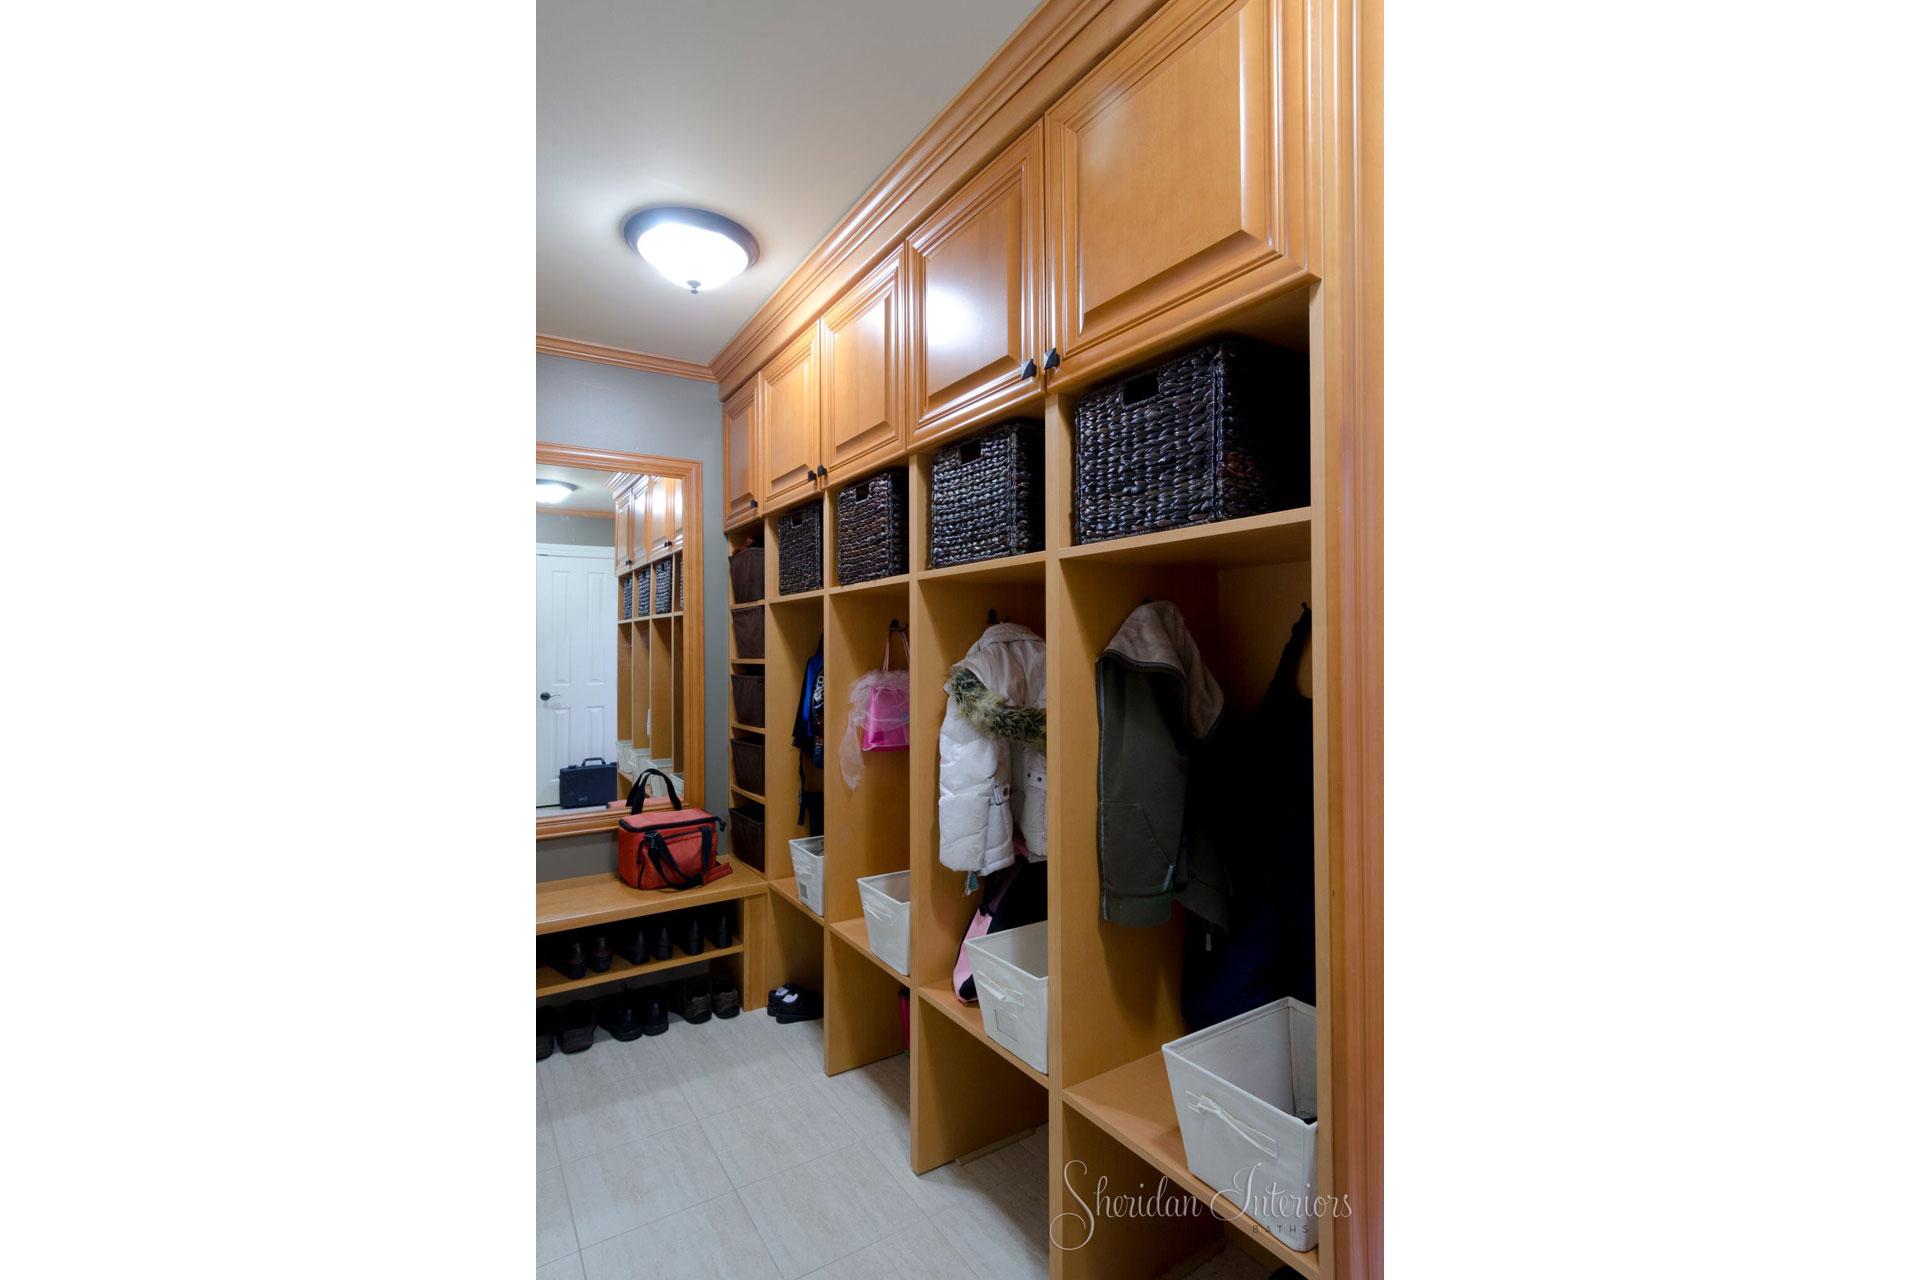 mudroom design, interior designer cornwall, interior design ottawa, Mudroom with Cubbies - Sheridan Interiors, sheridan interiors kitchens and baths